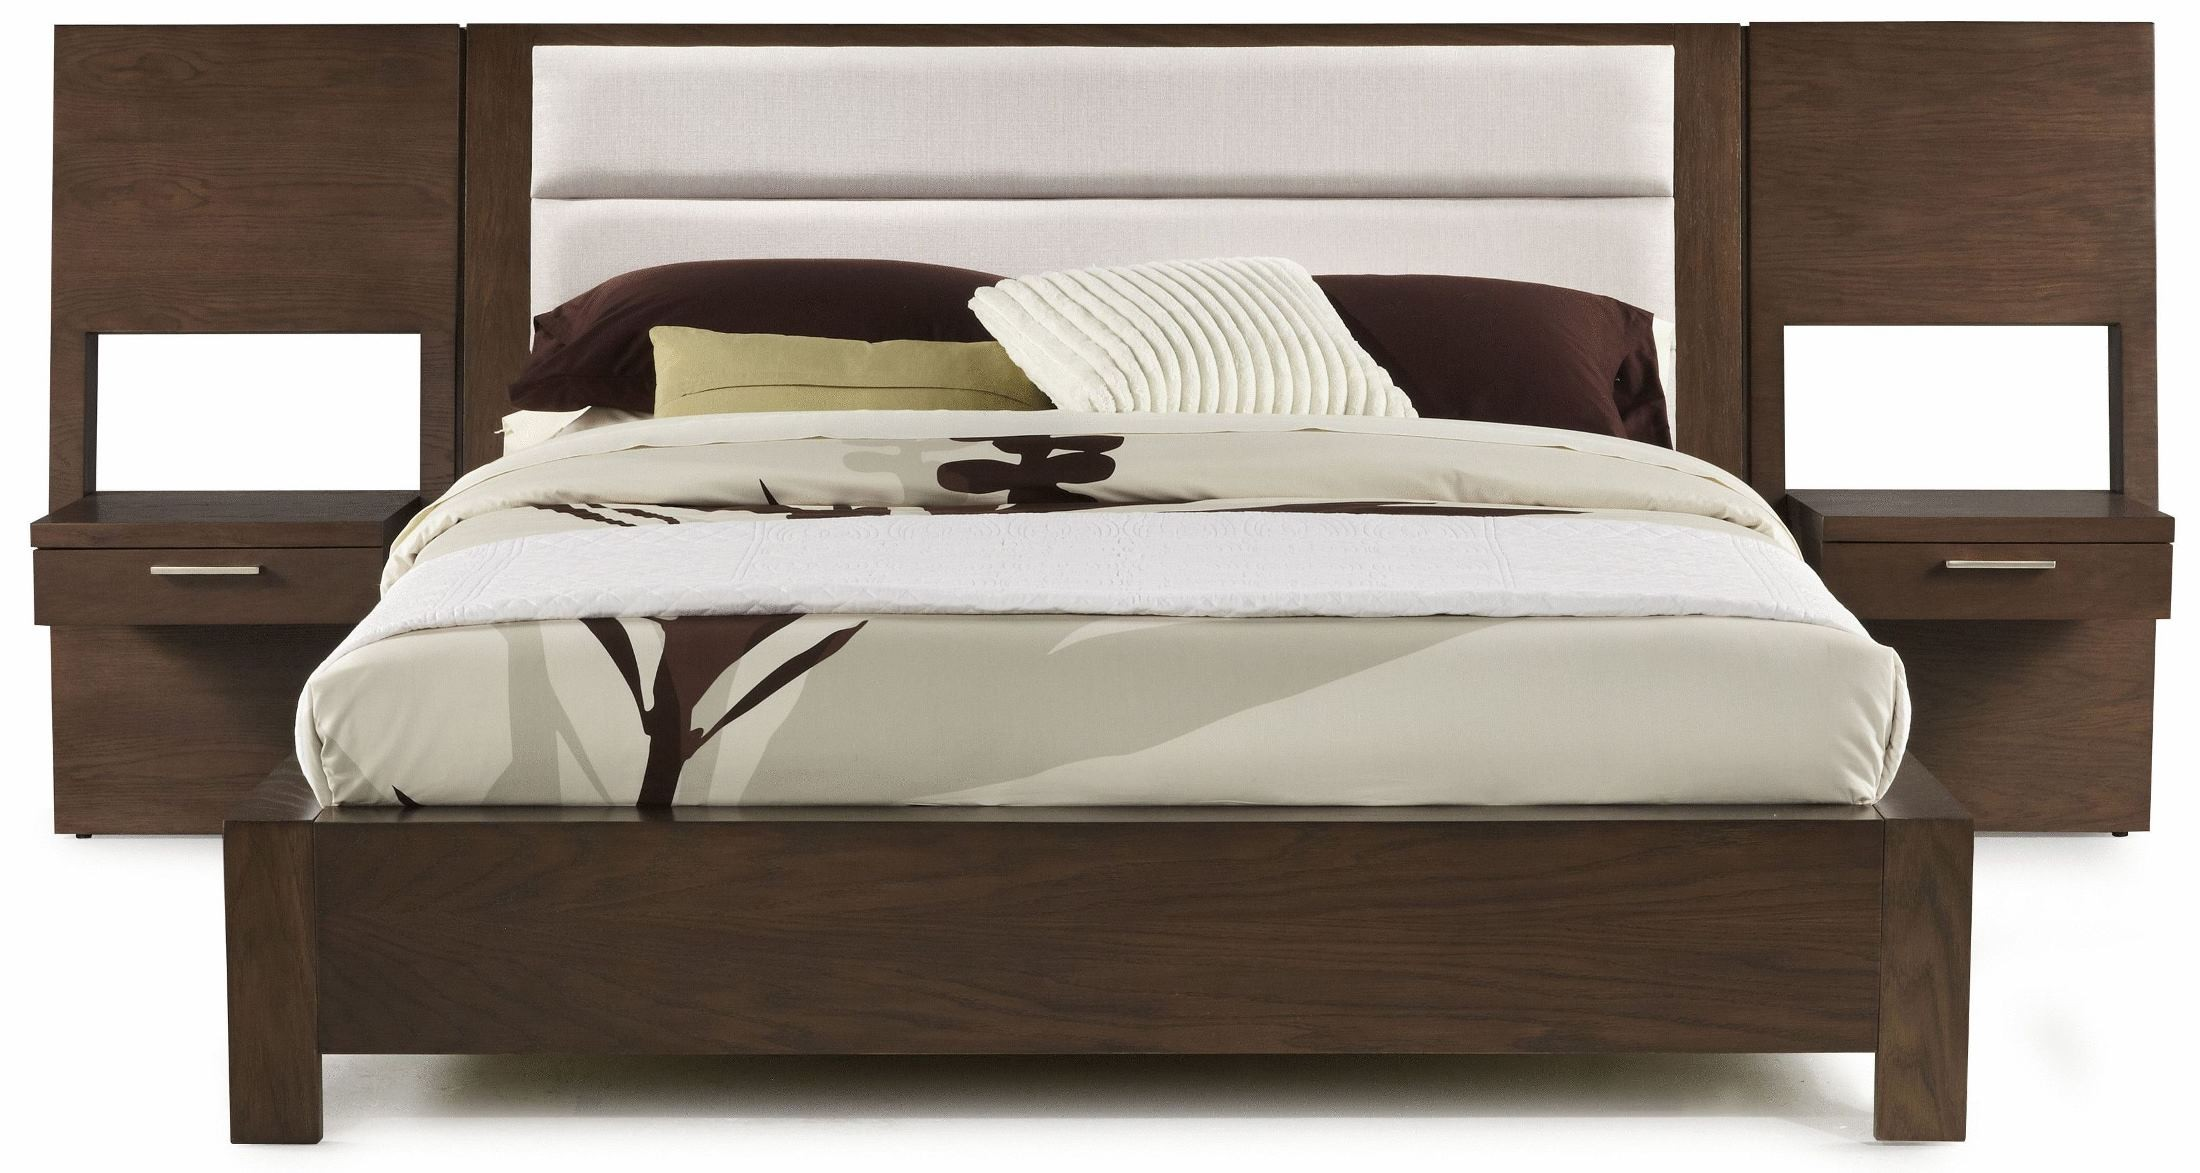 Hudson Upholstered Platform Bedroom Set With Panel Nightstands From Casana 525 908kq Coleman